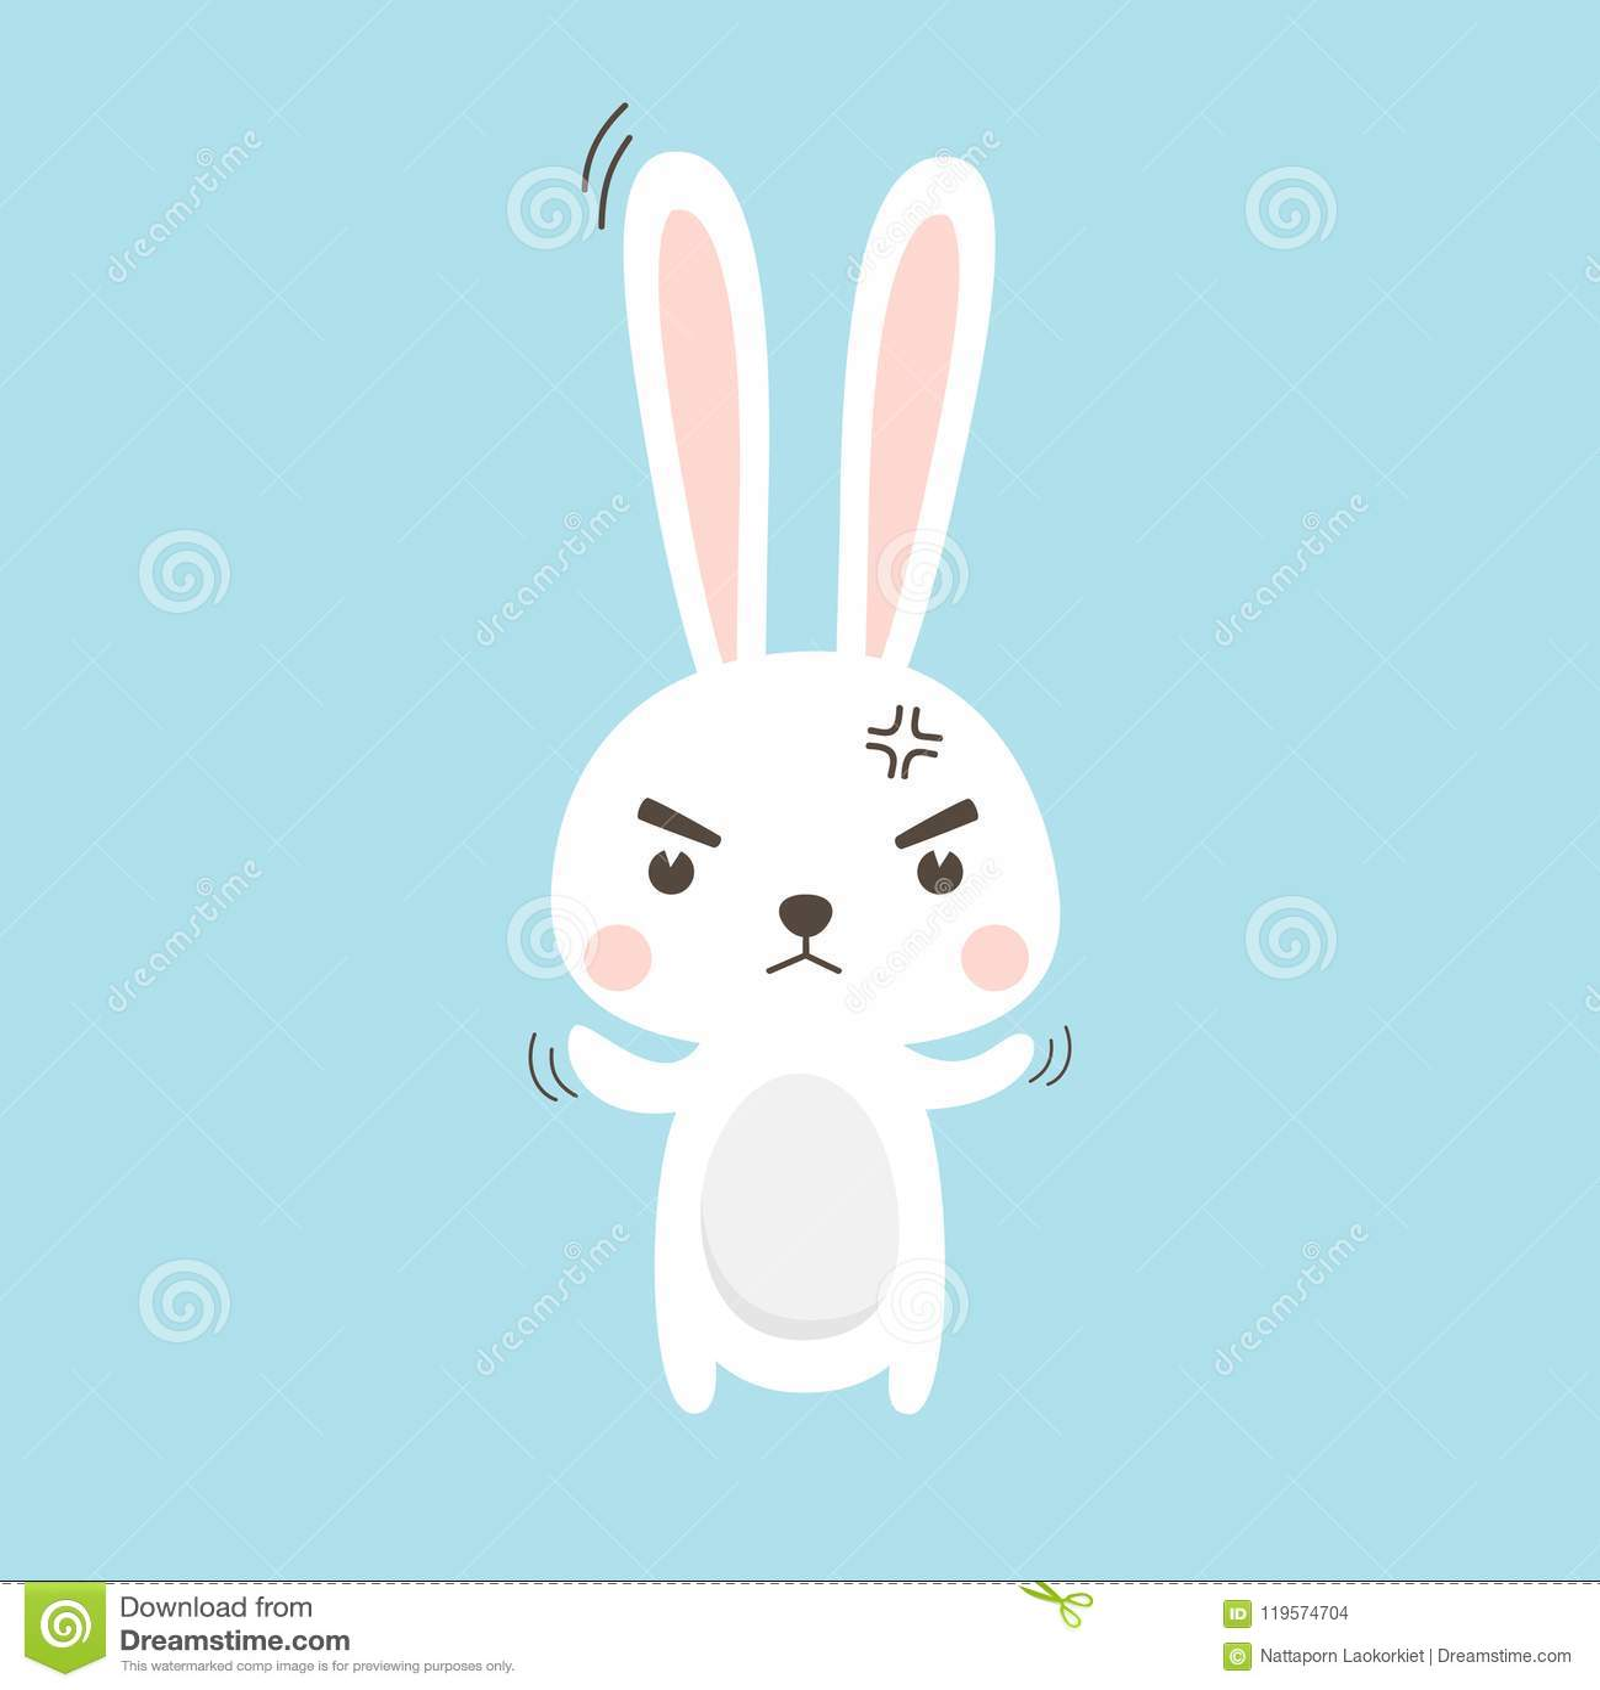 Angry Rabbit. Easter Bunny Vector illustration cartoon character.